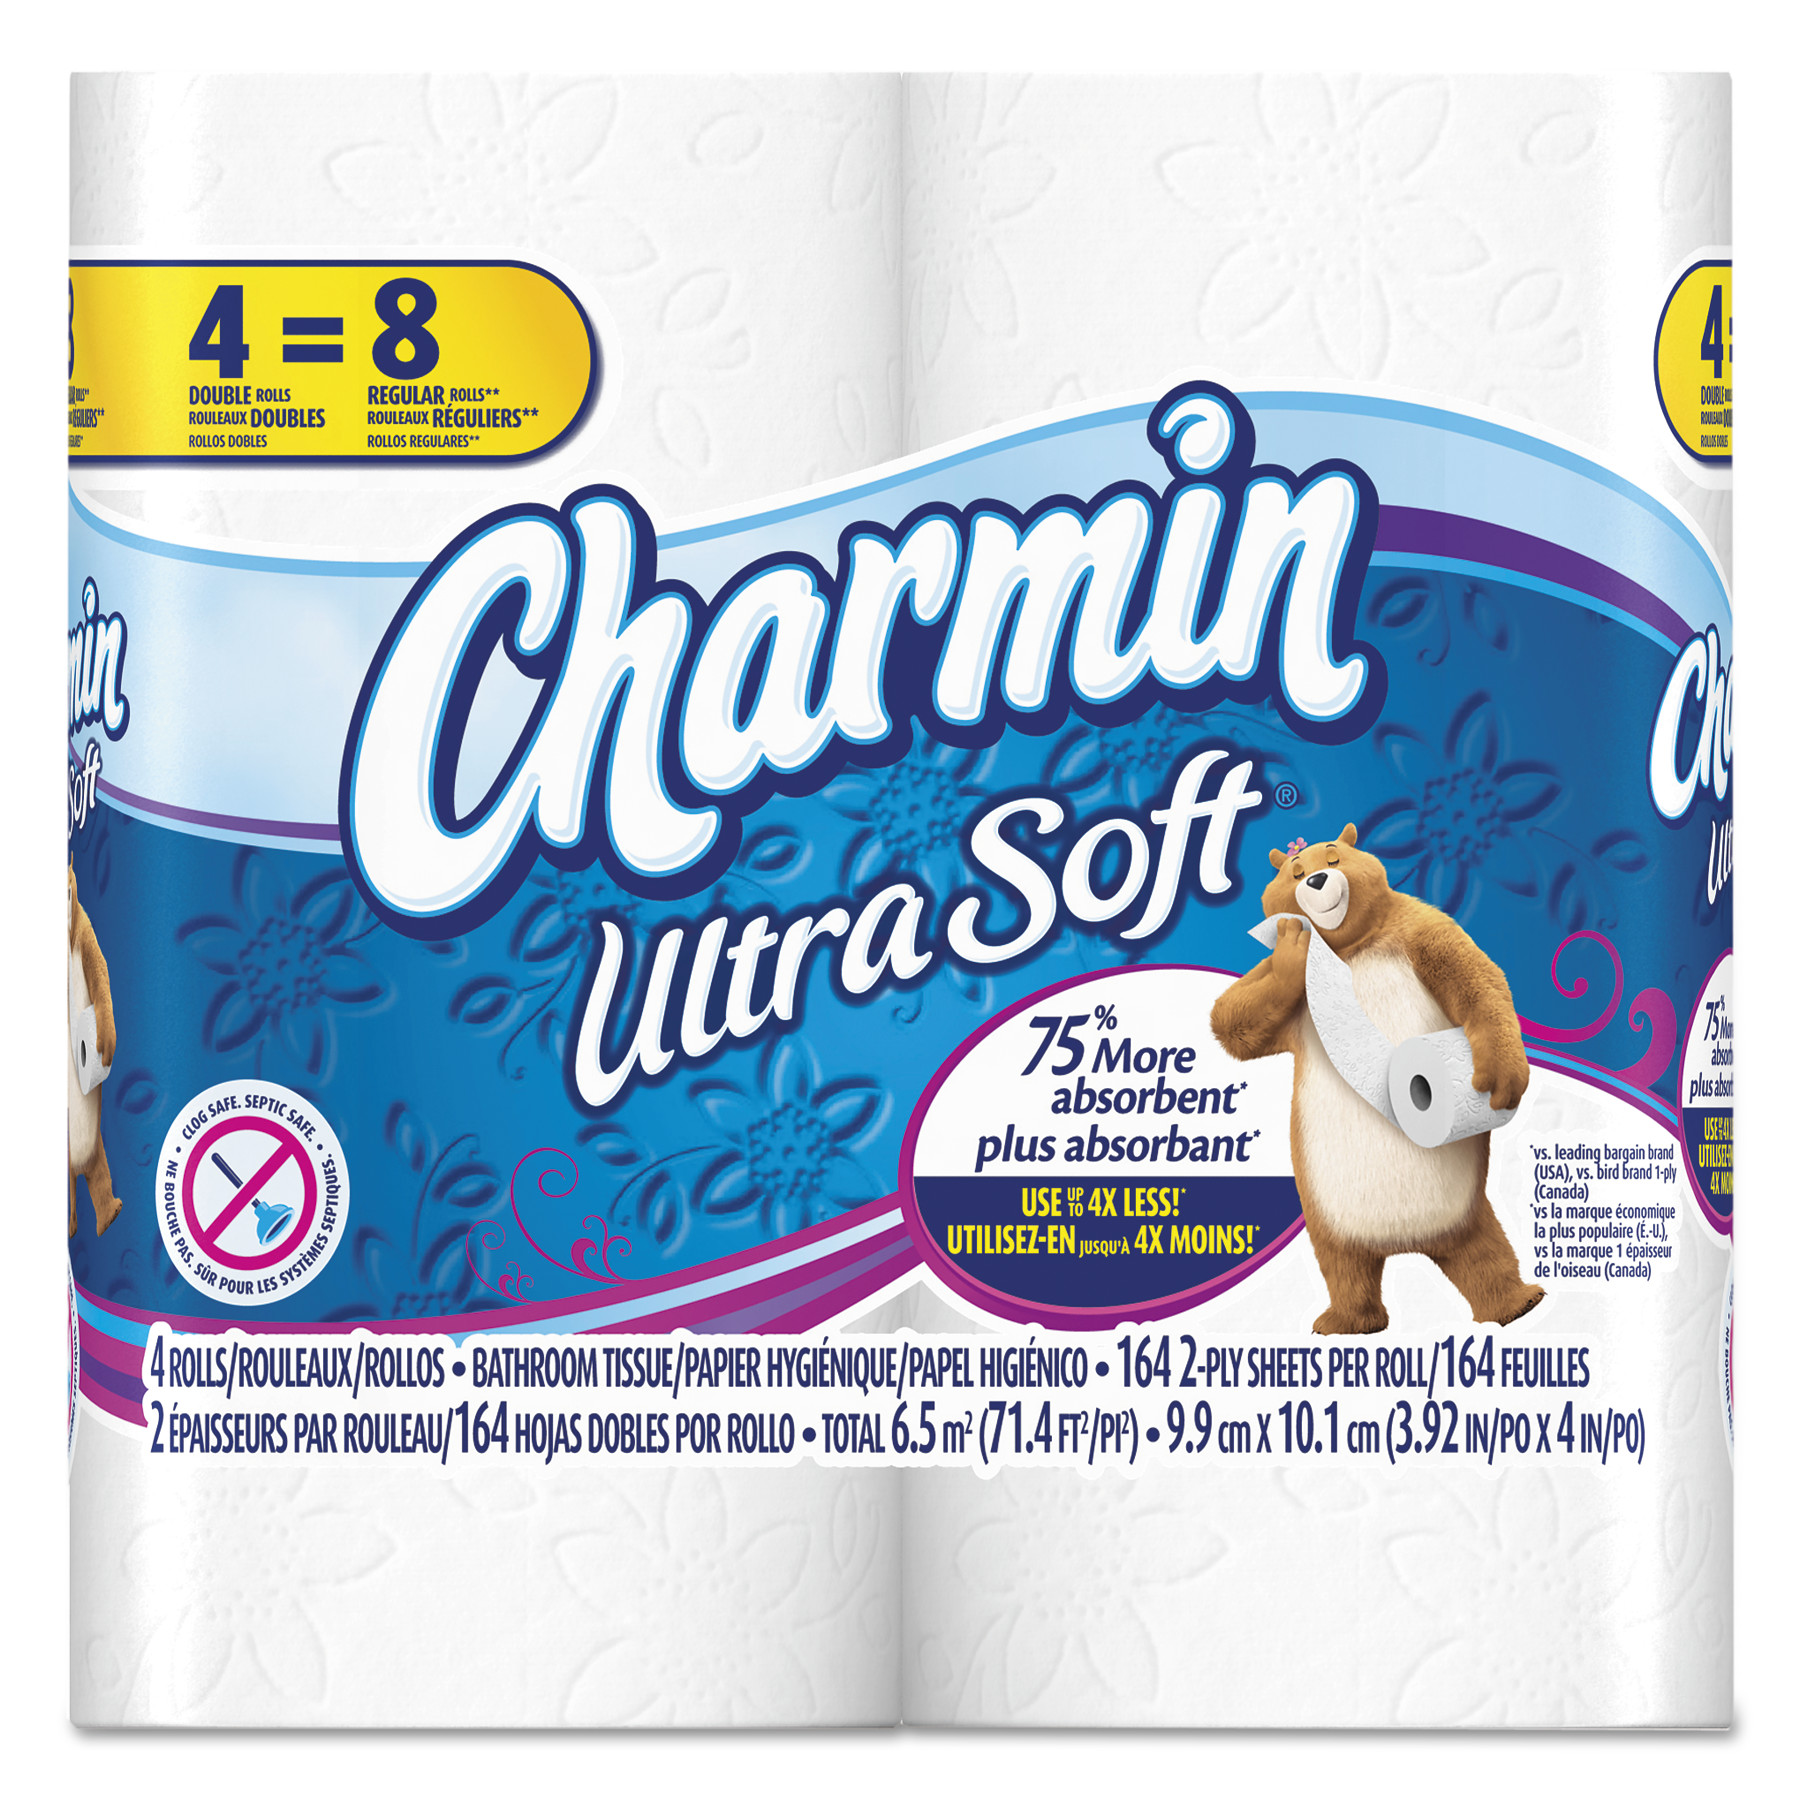 Charmin Ultra Soft Bathroom Tissue, 164 Sheets/Roll, 4 Rolls/Pack